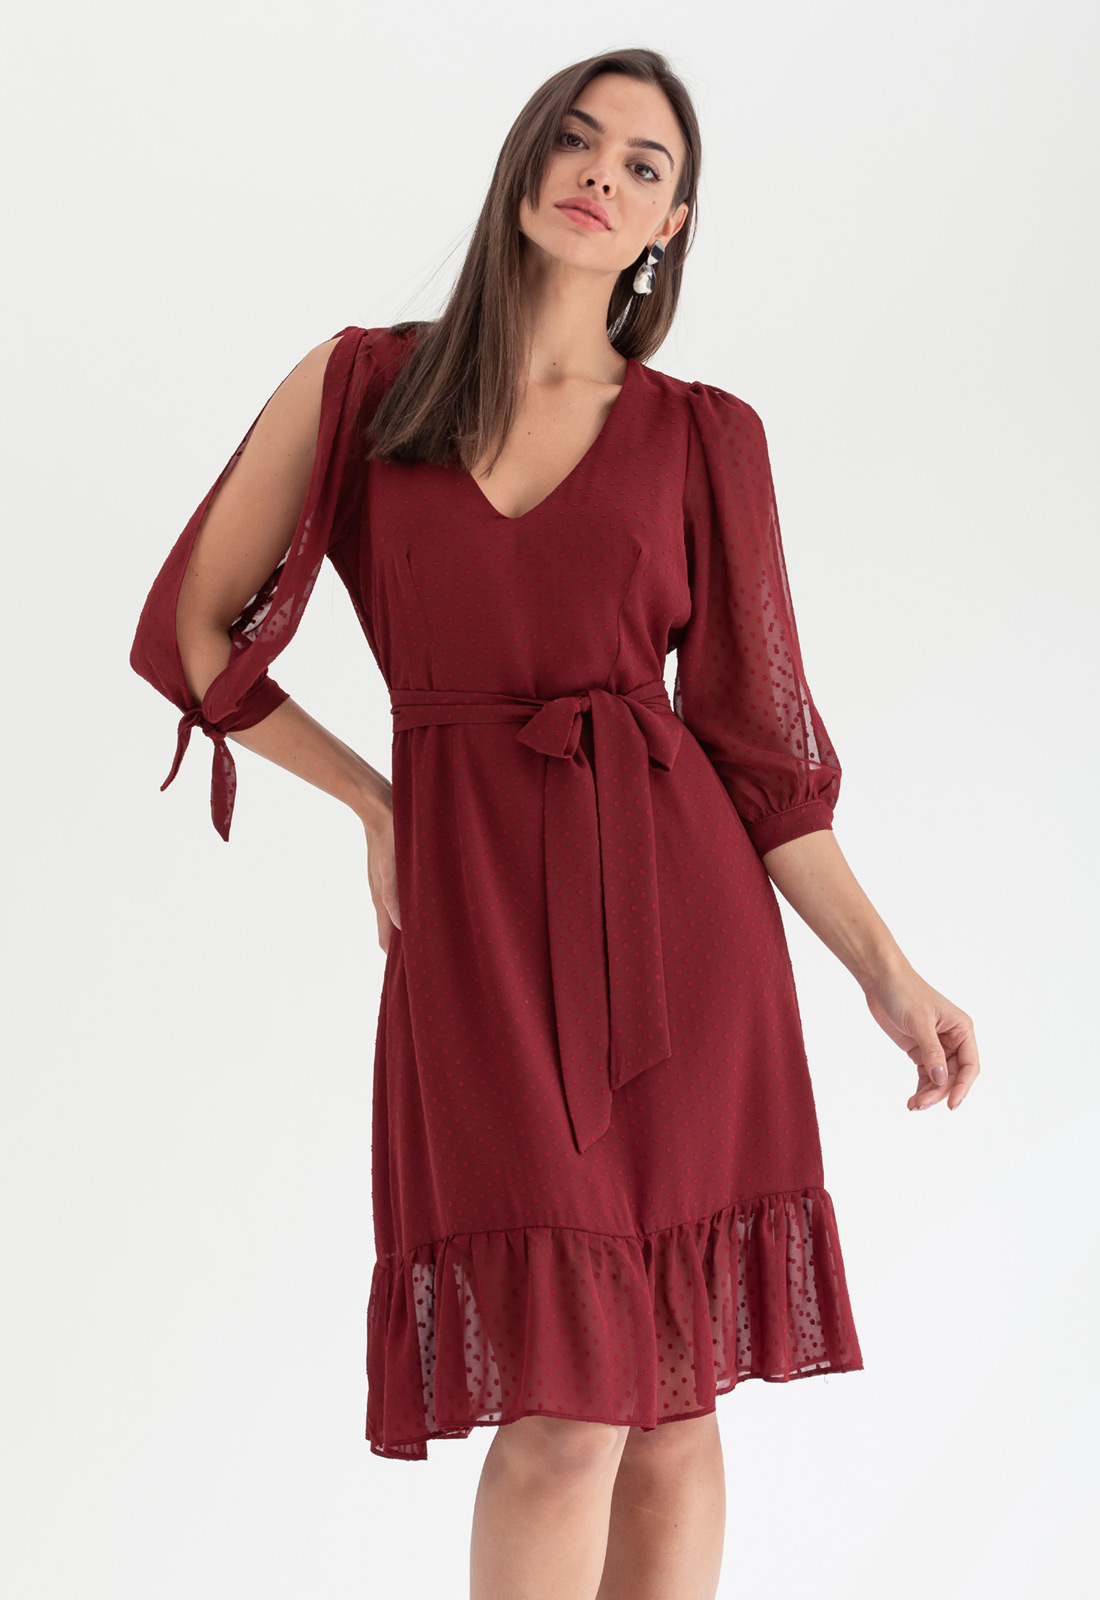 Vestido de festa curto marsala ref. 2584